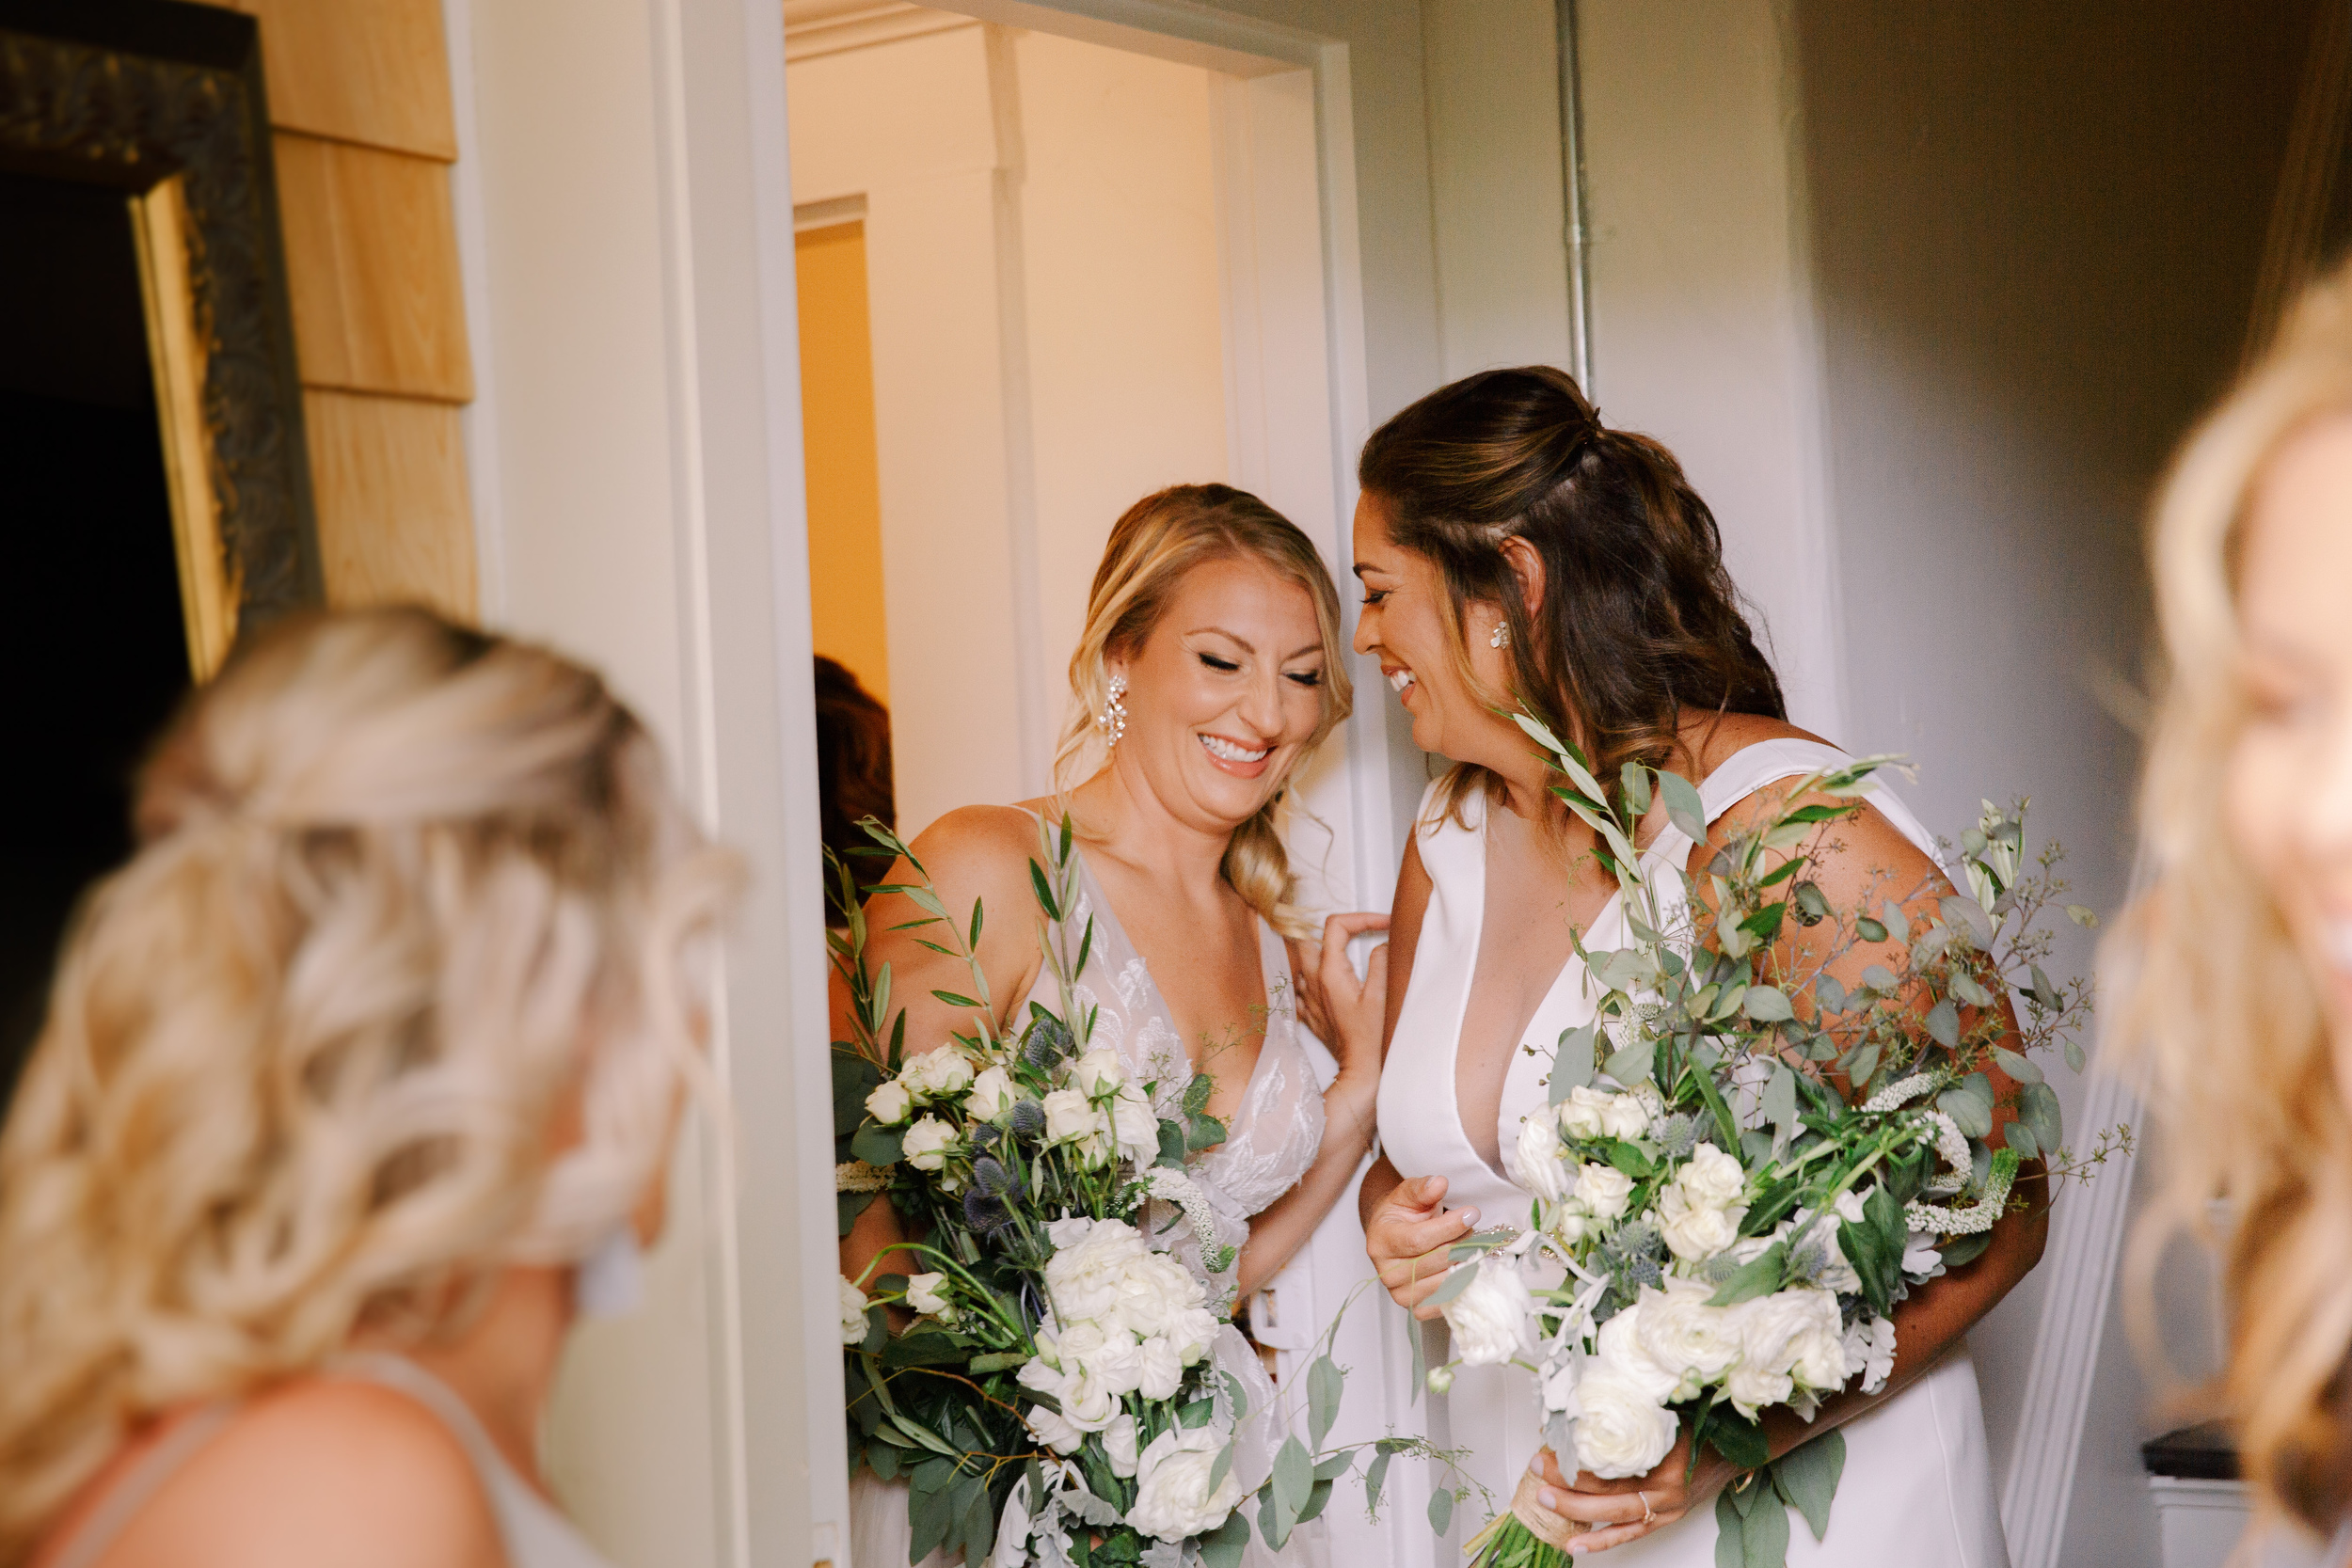 provincetown_same_sex_downtown_wedding_12.JPG